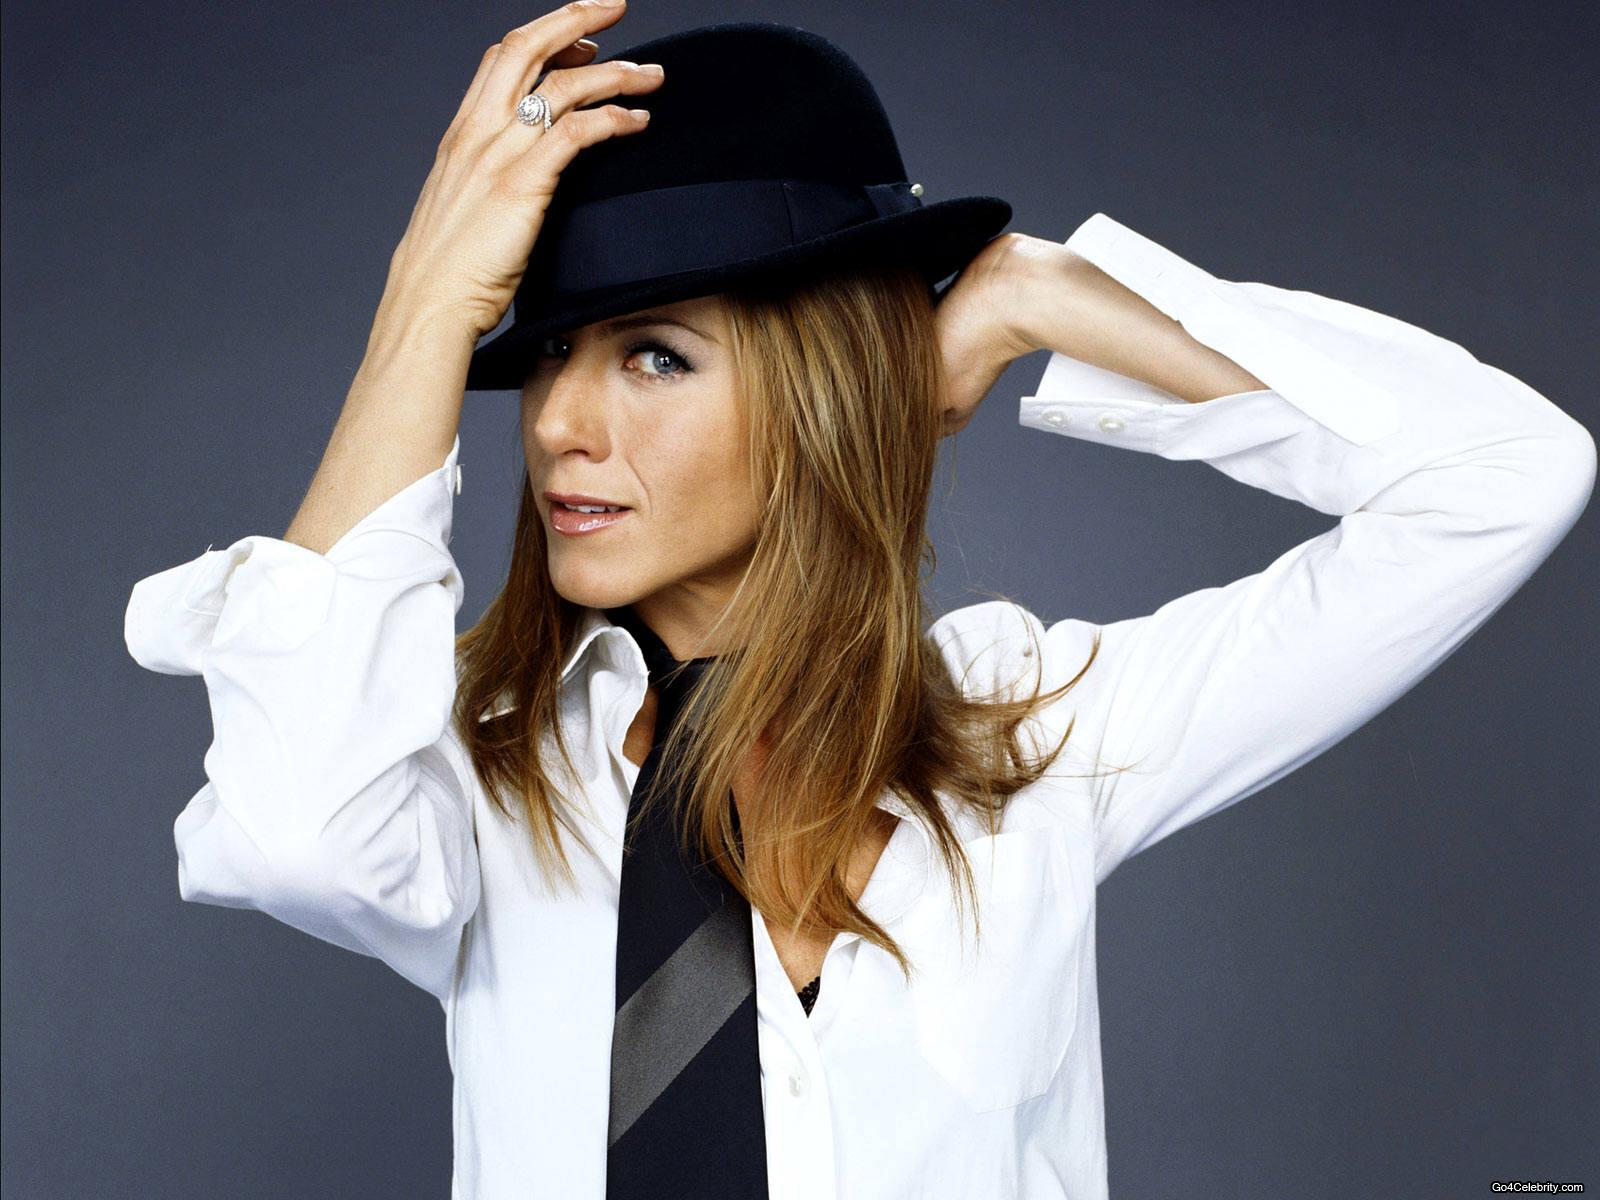 http://3.bp.blogspot.com/_z5FfbwAlP1w/TOB5lx0MTaI/AAAAAAAACNA/EXBz1O2pnW0/s1600/Jennifer-Aniston-jennifer-aniston-81363_1600_1200.jpg